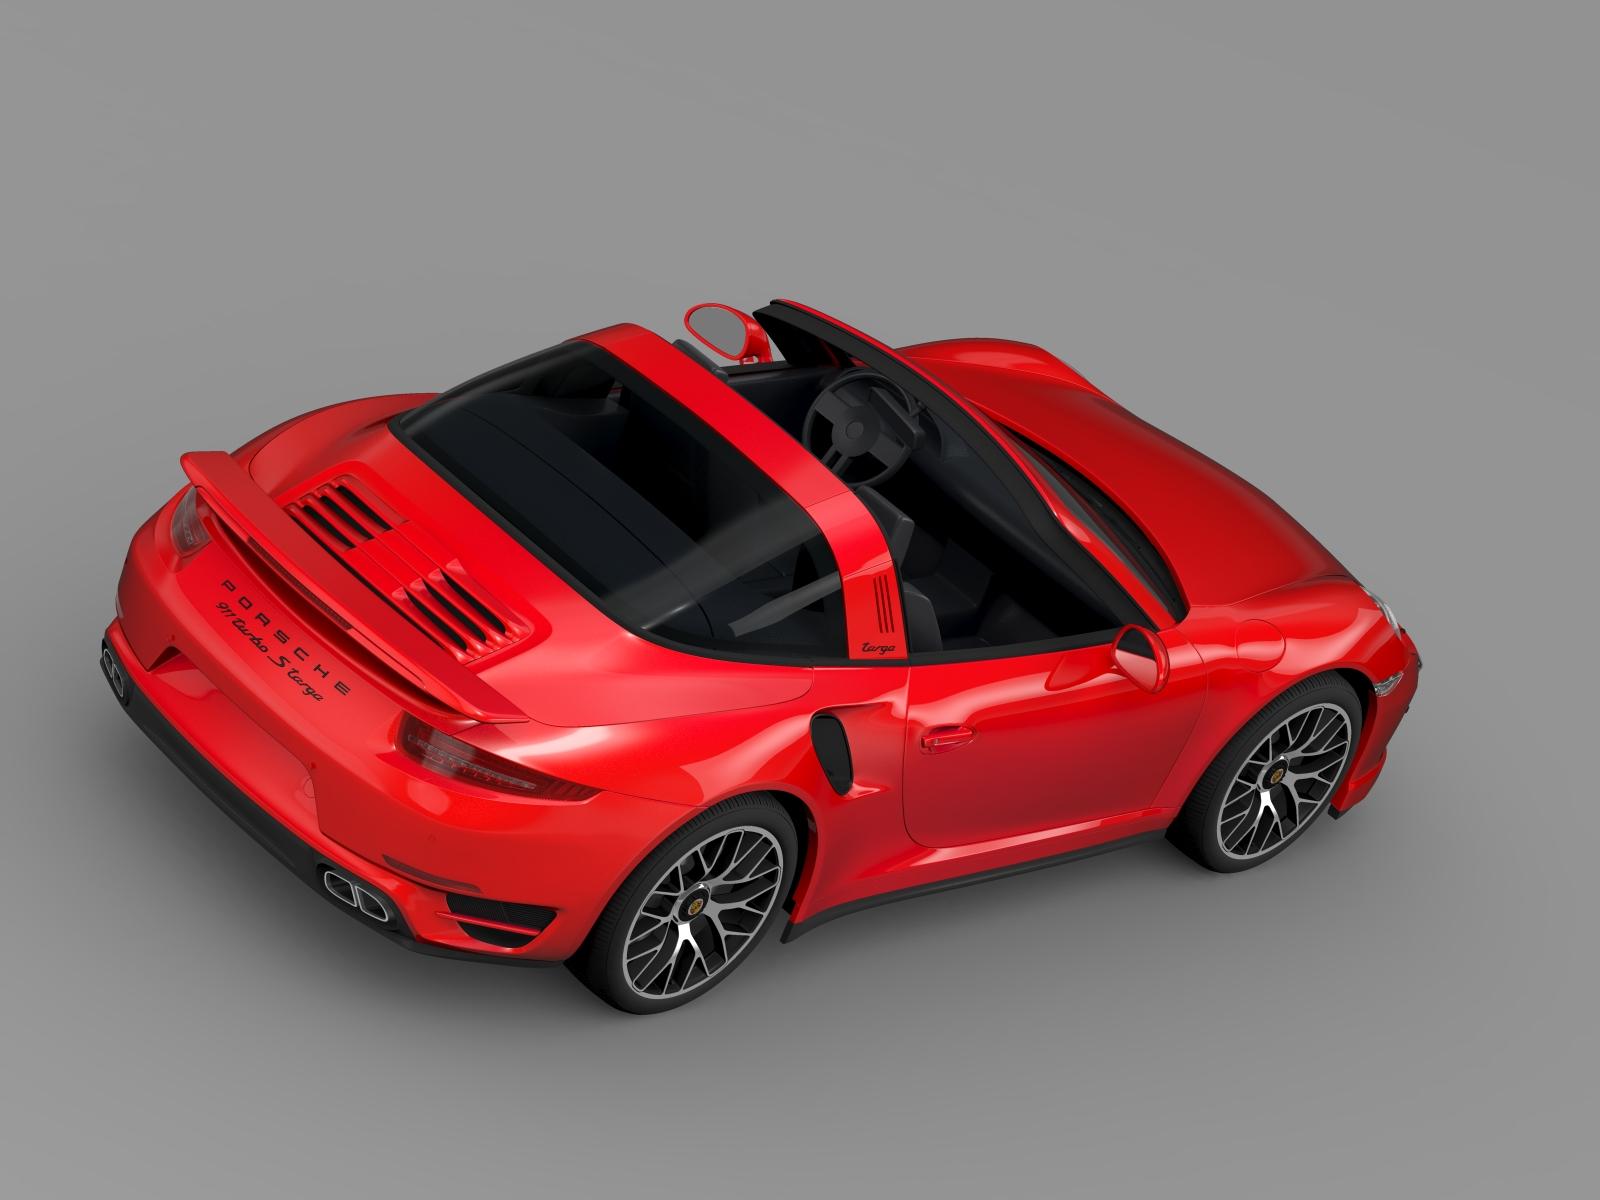 porsche 911 turbo s targa 991 2016 3d model flatpyramid. Black Bedroom Furniture Sets. Home Design Ideas